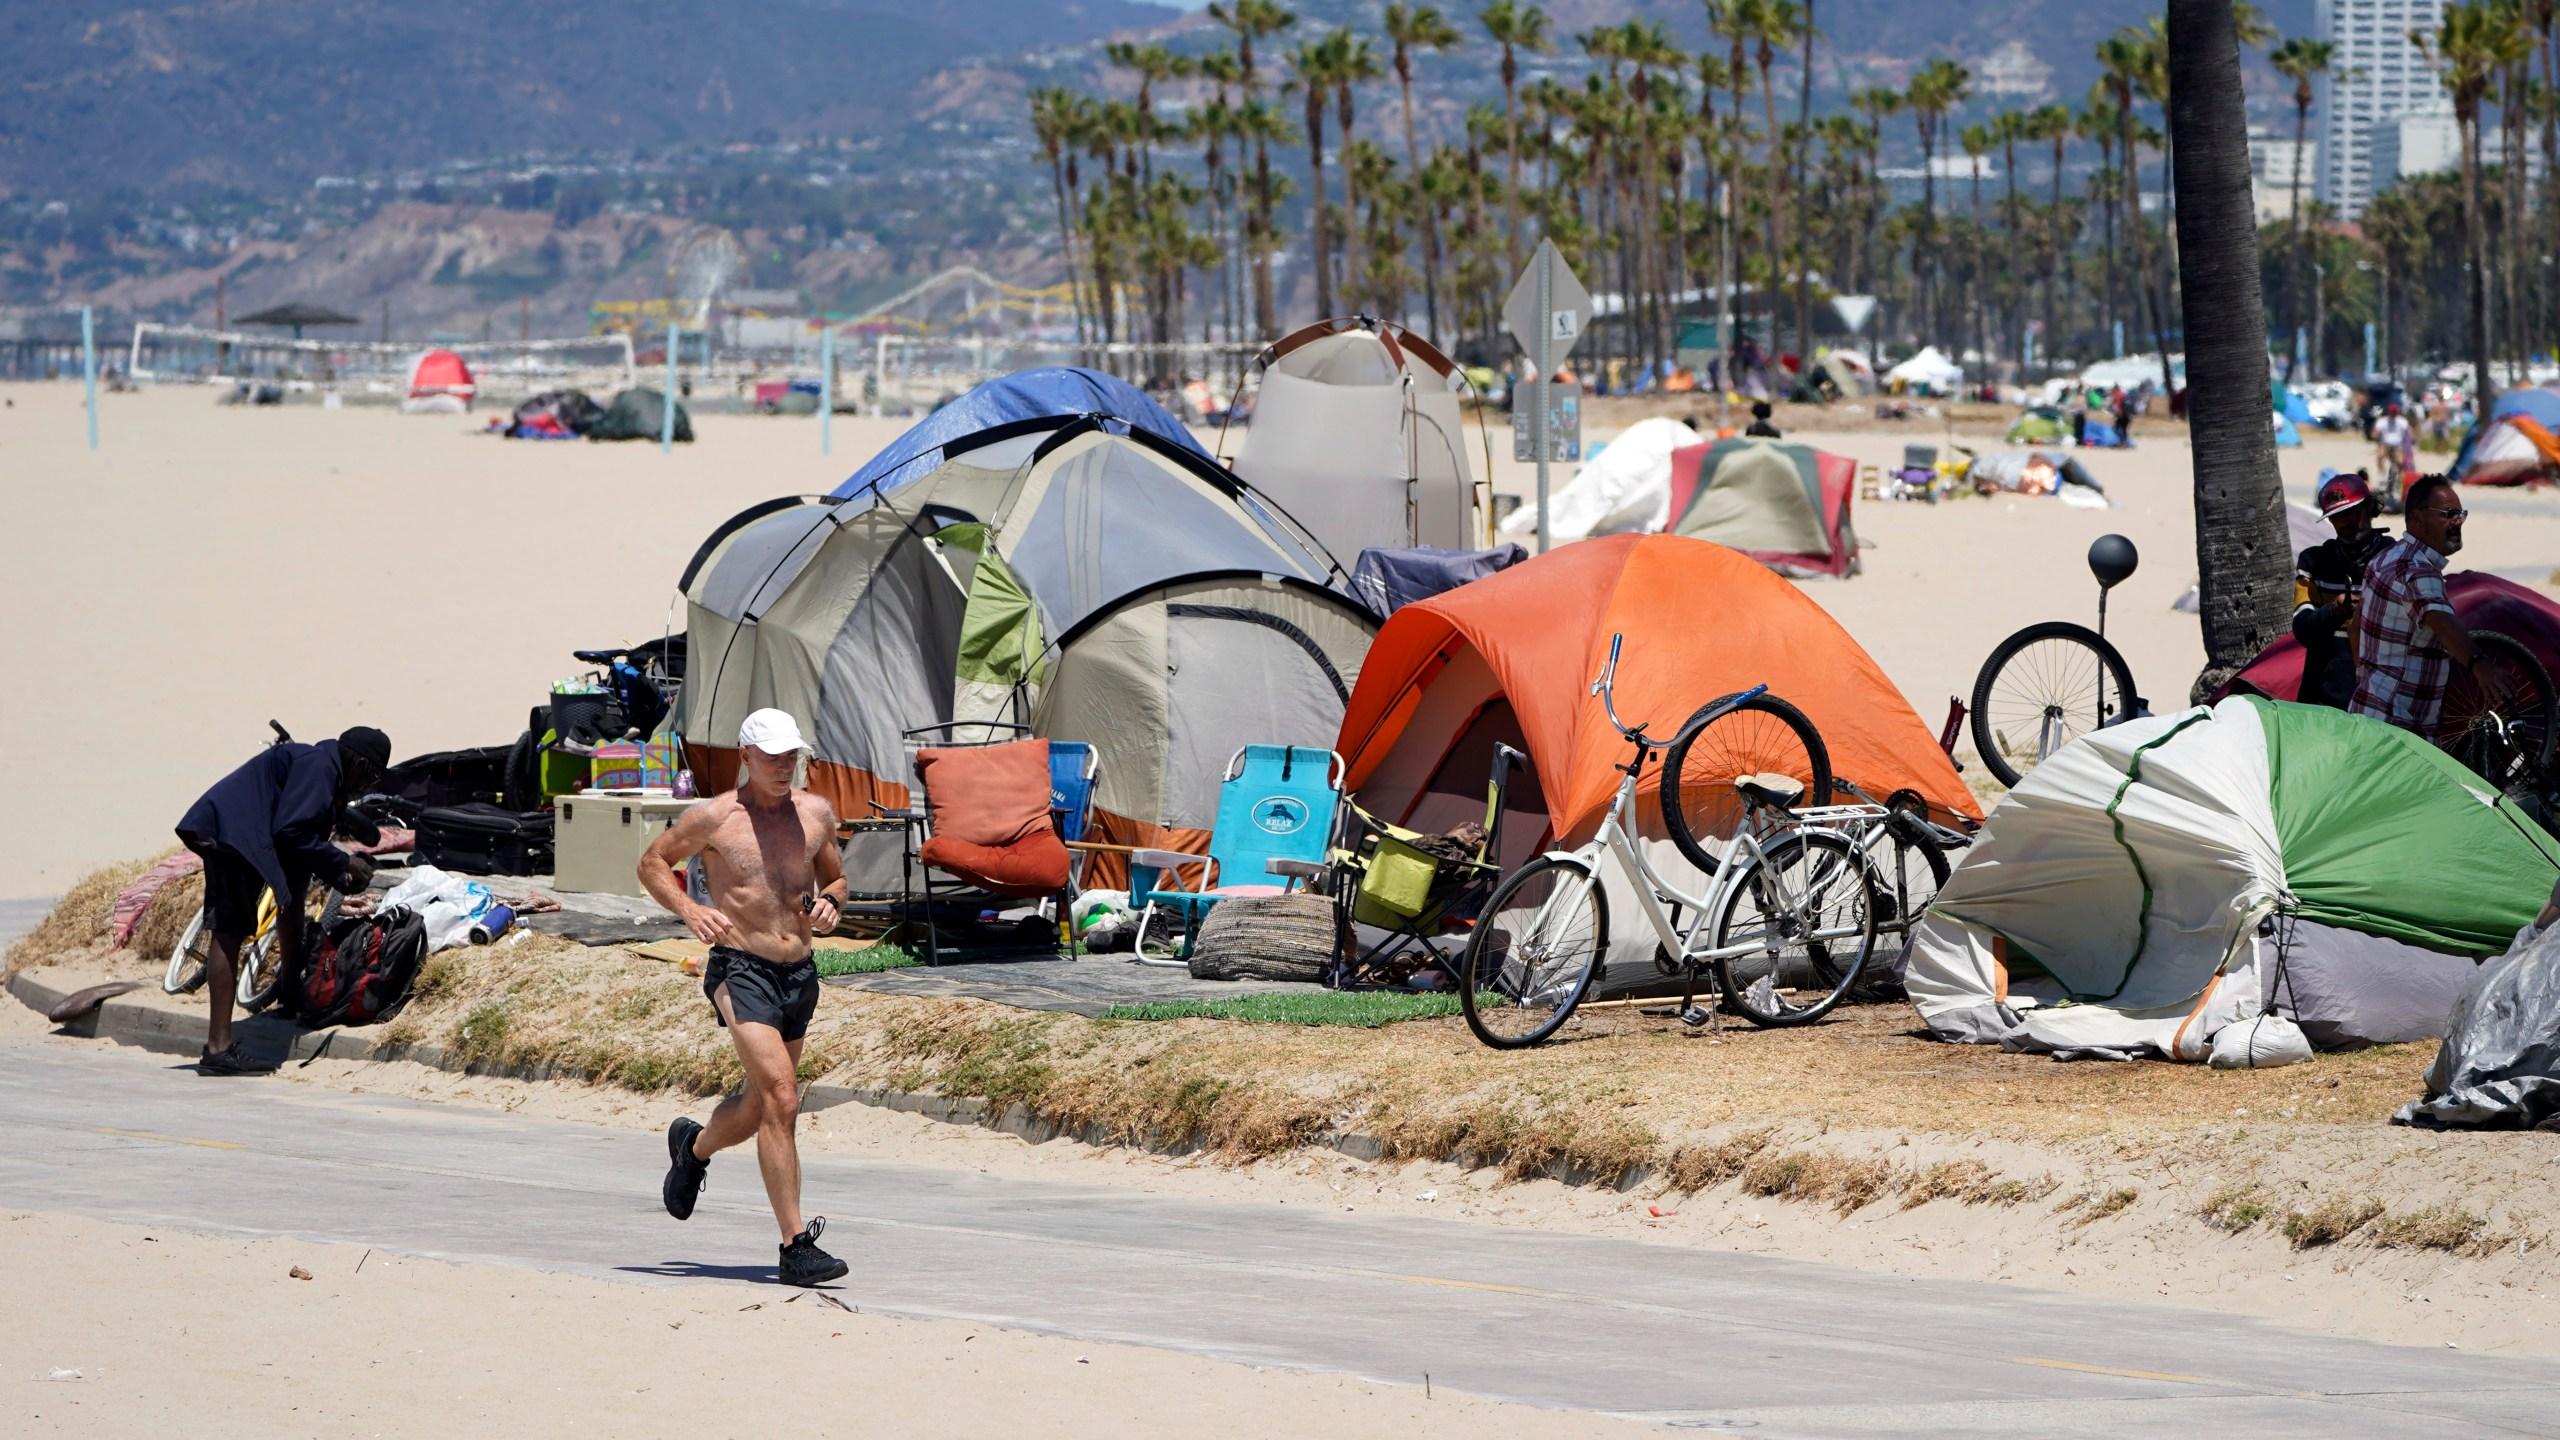 A jogger walks past a homeless encampment Tuesday, June 8, 2021, in the Venice Beach section of Los Angeles. (AP Photo/Marcio Jose Sanchez)